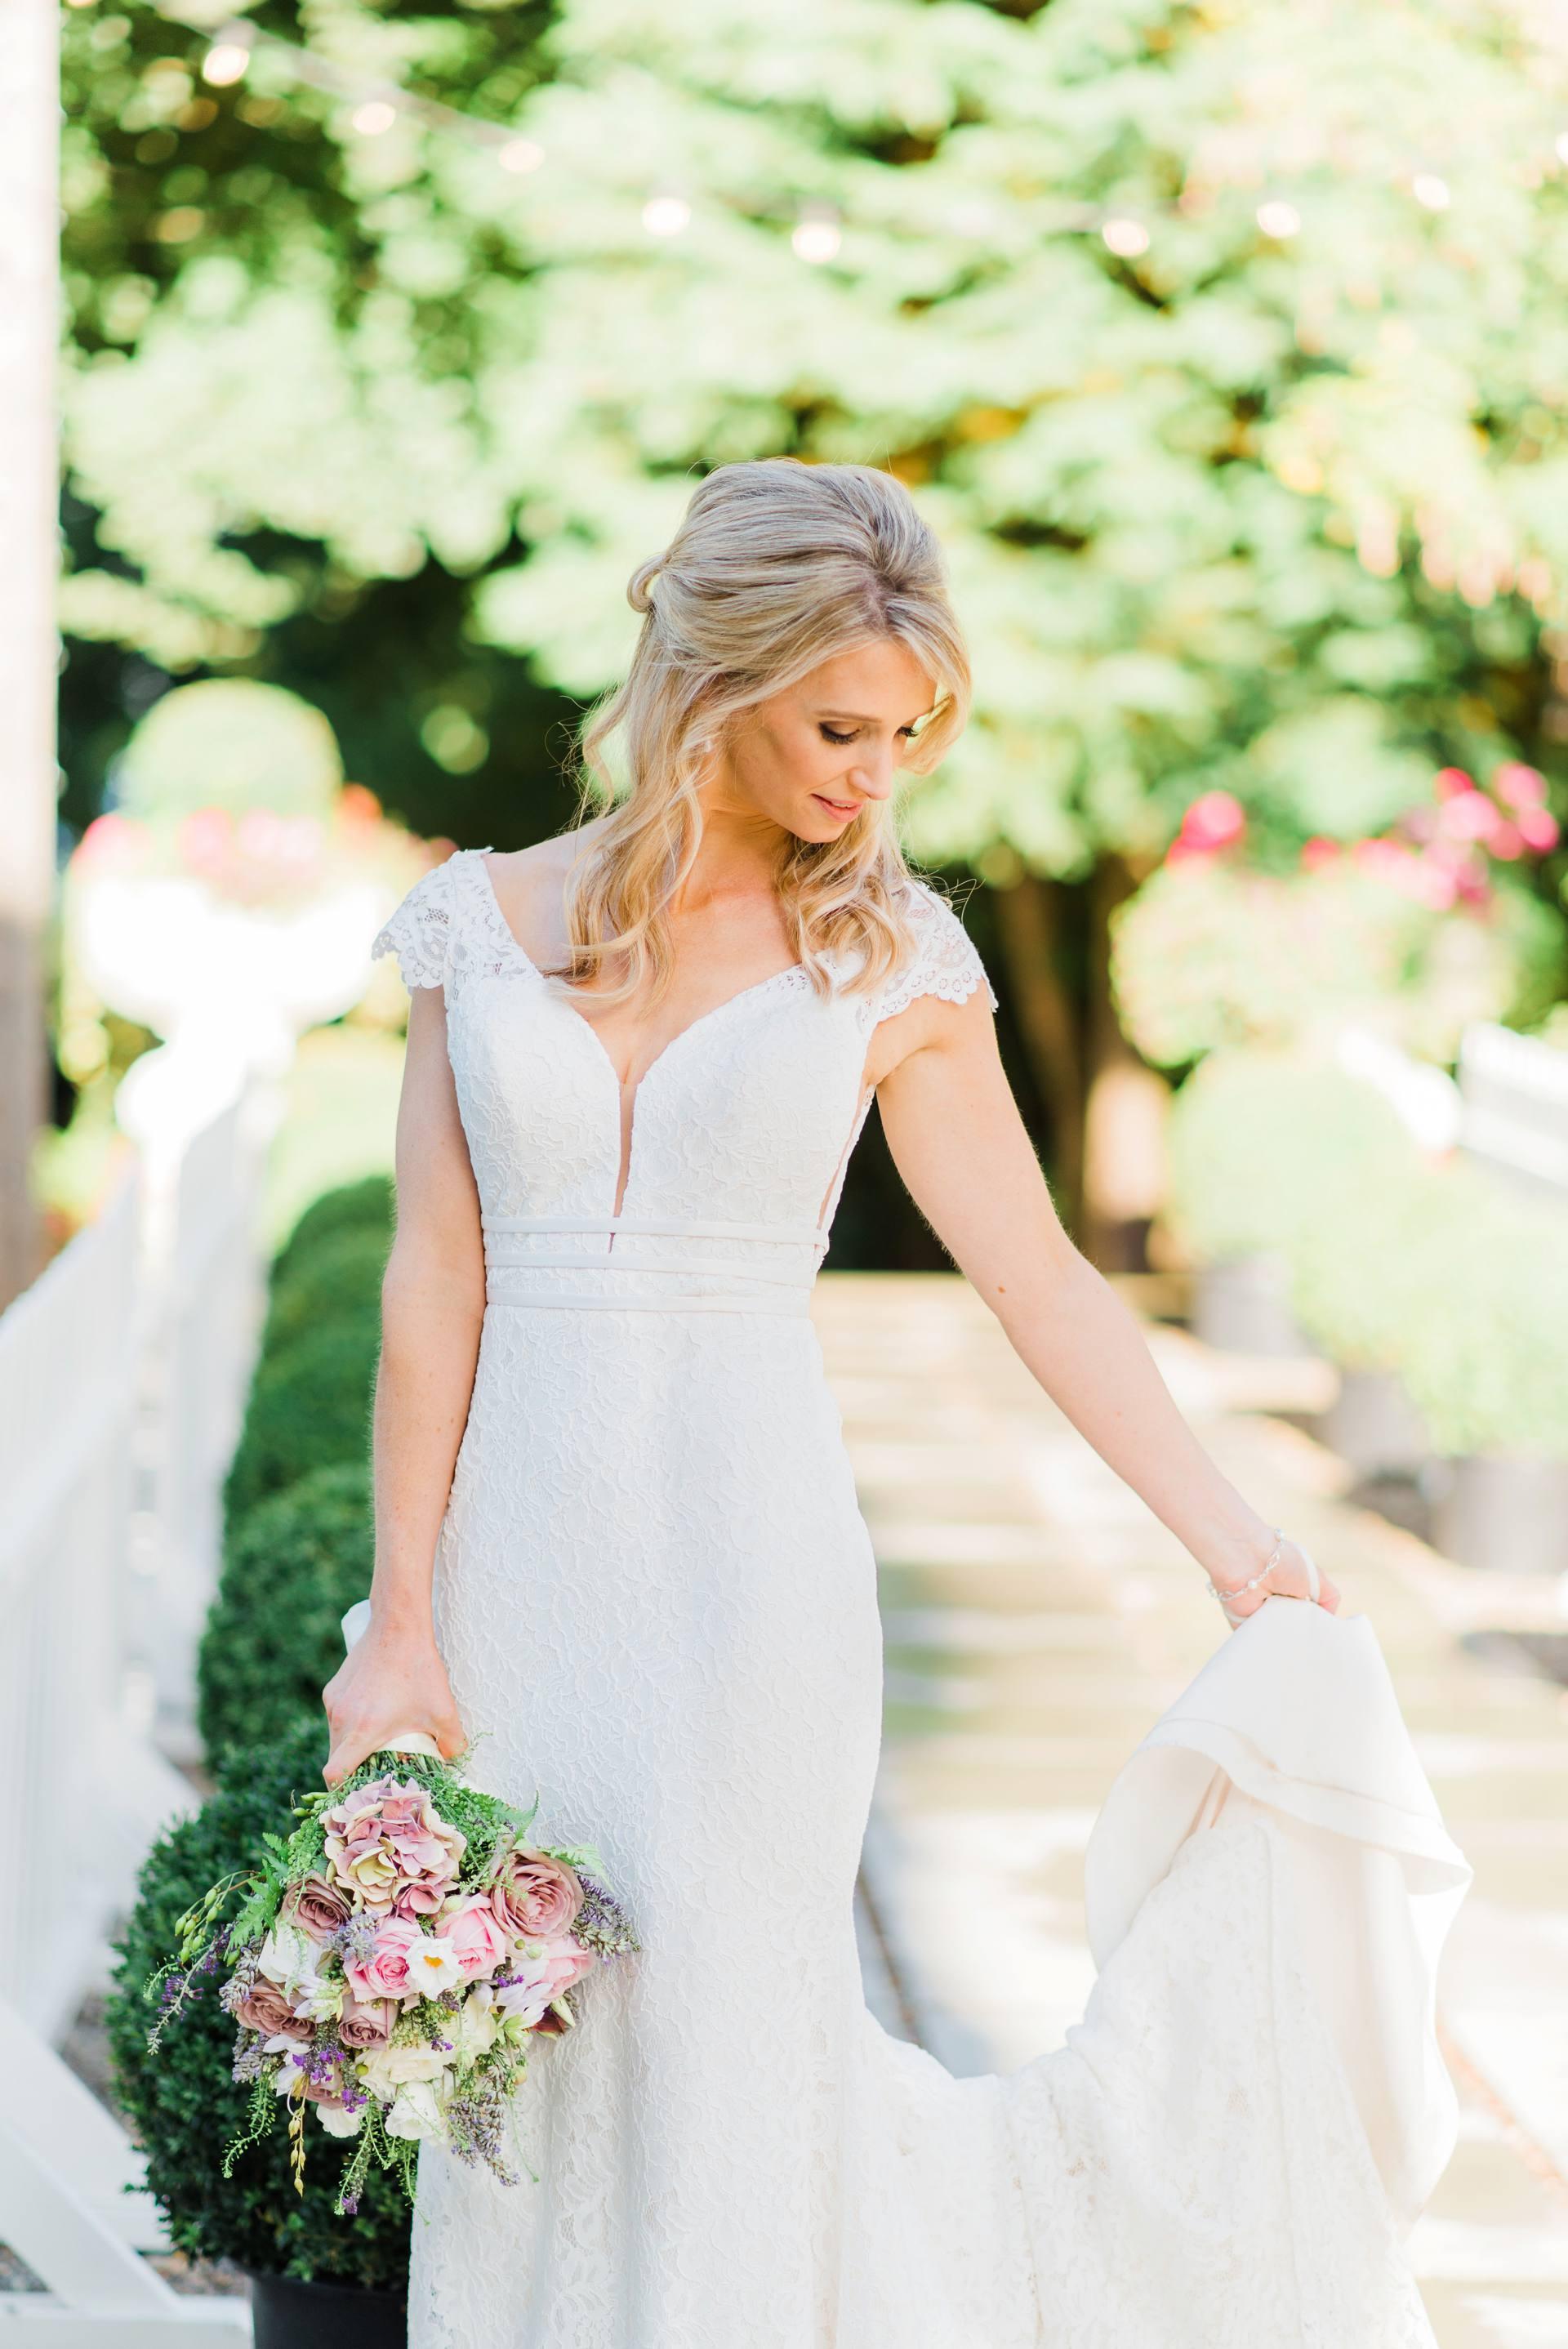 Bride holding up her wedding dress